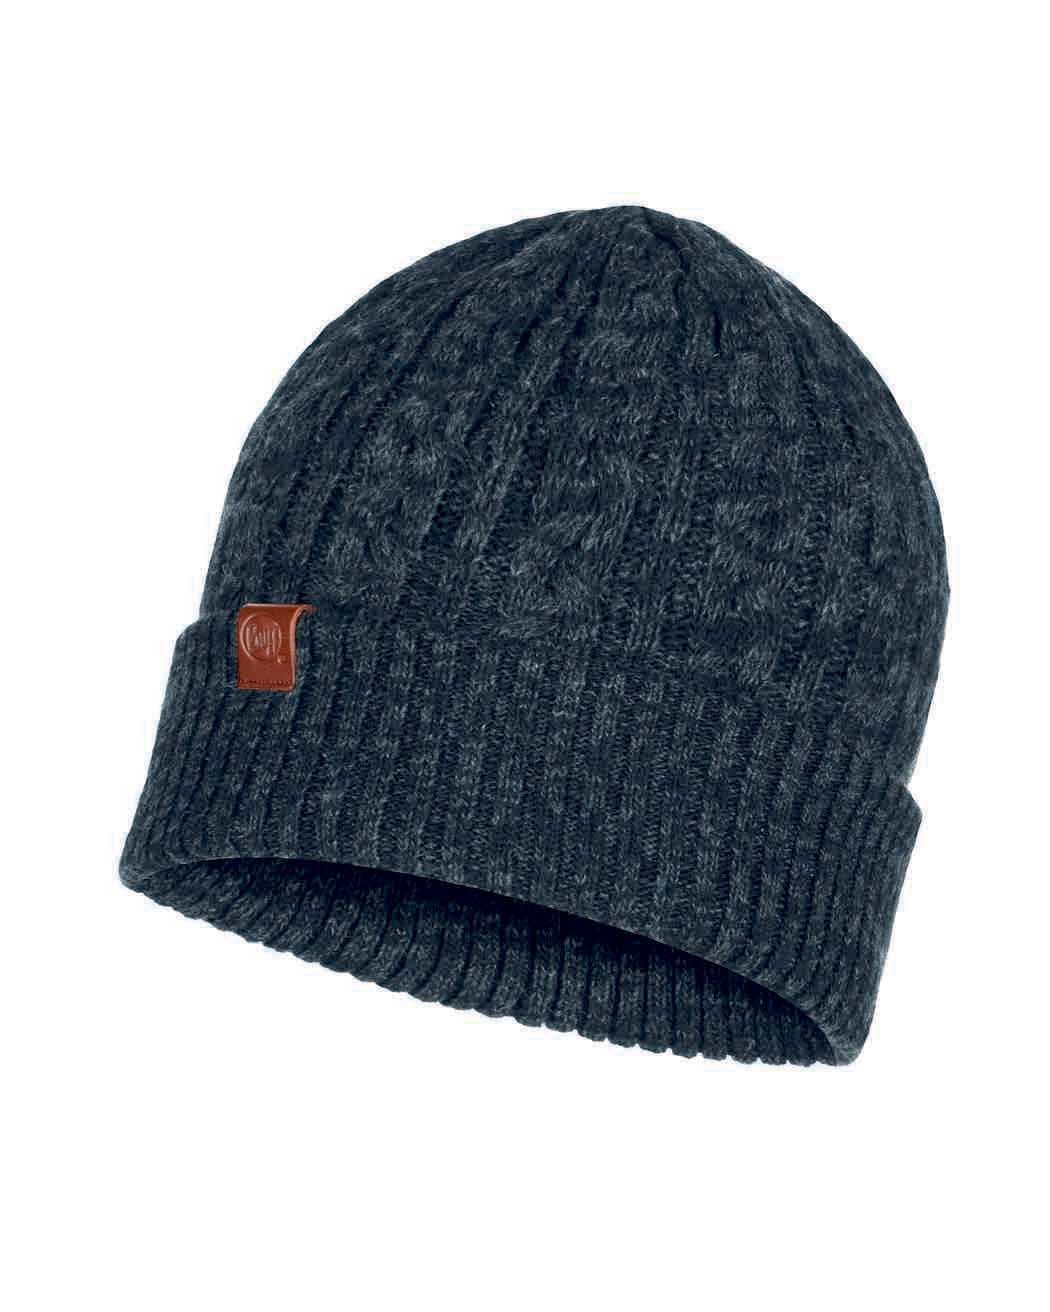 Вязаная шапка Buff Hat Knitted Braidy Black